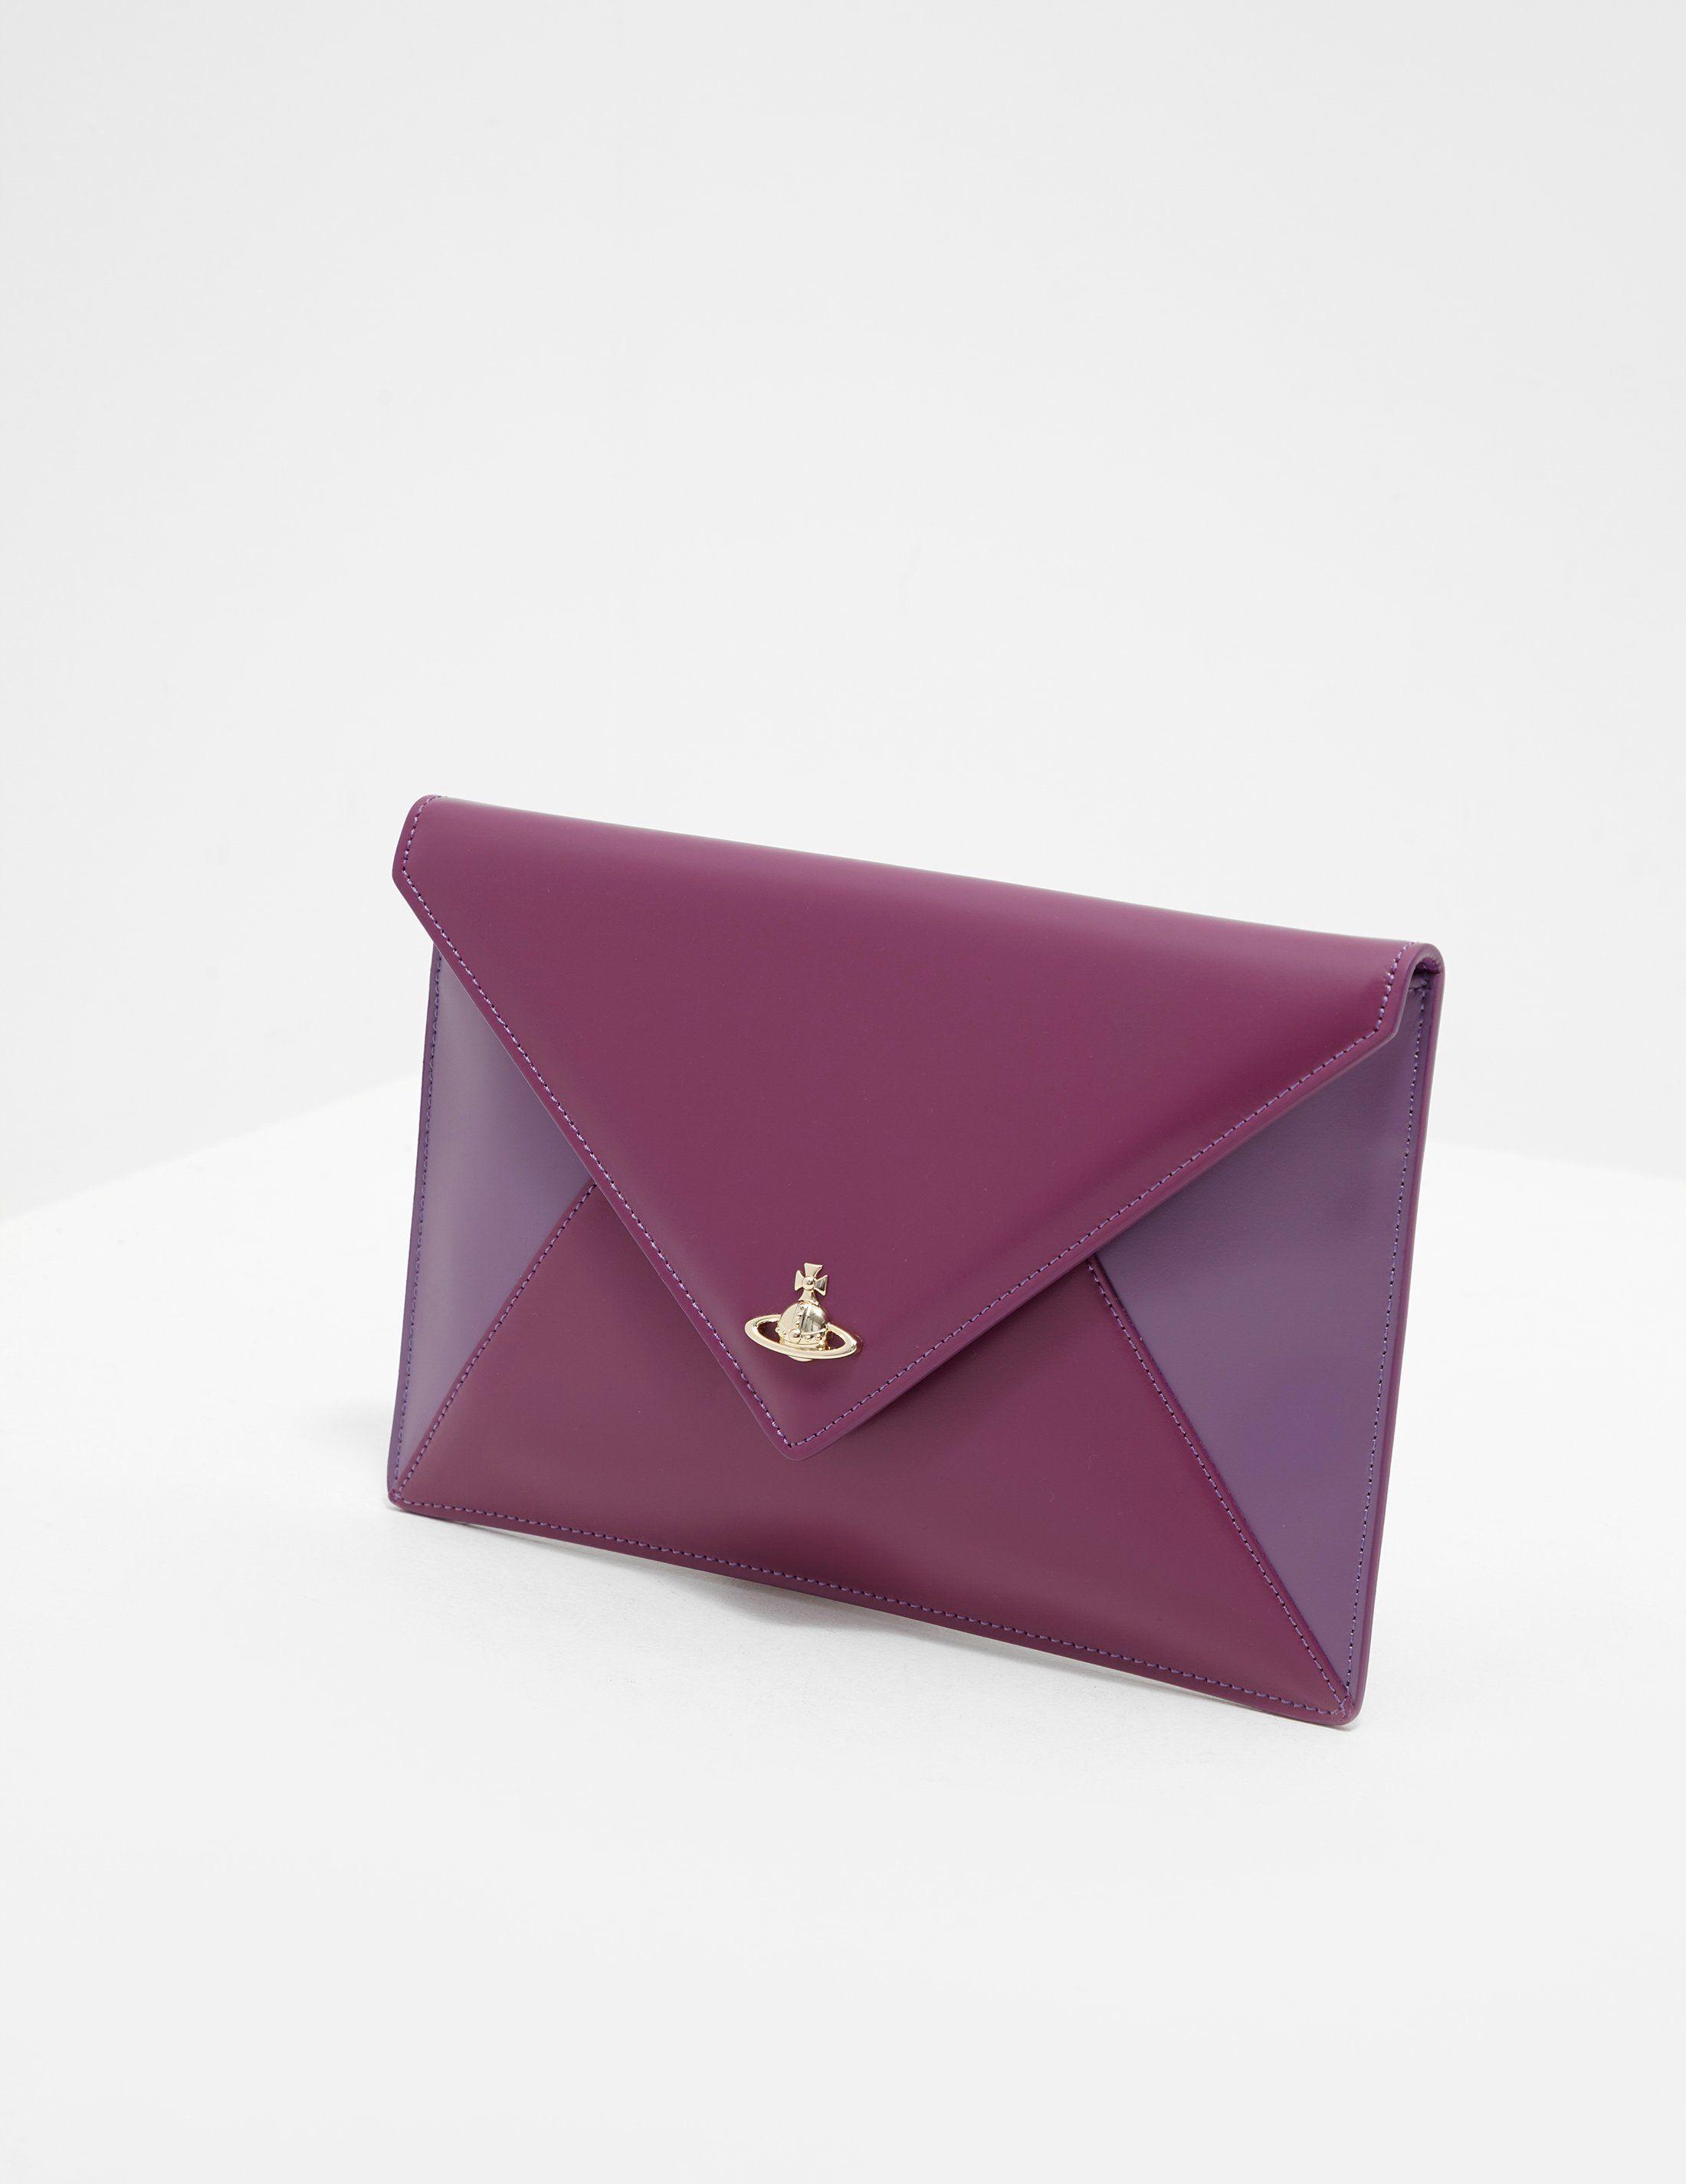 Vivienne Westwood Private Pouch Clutch Bag